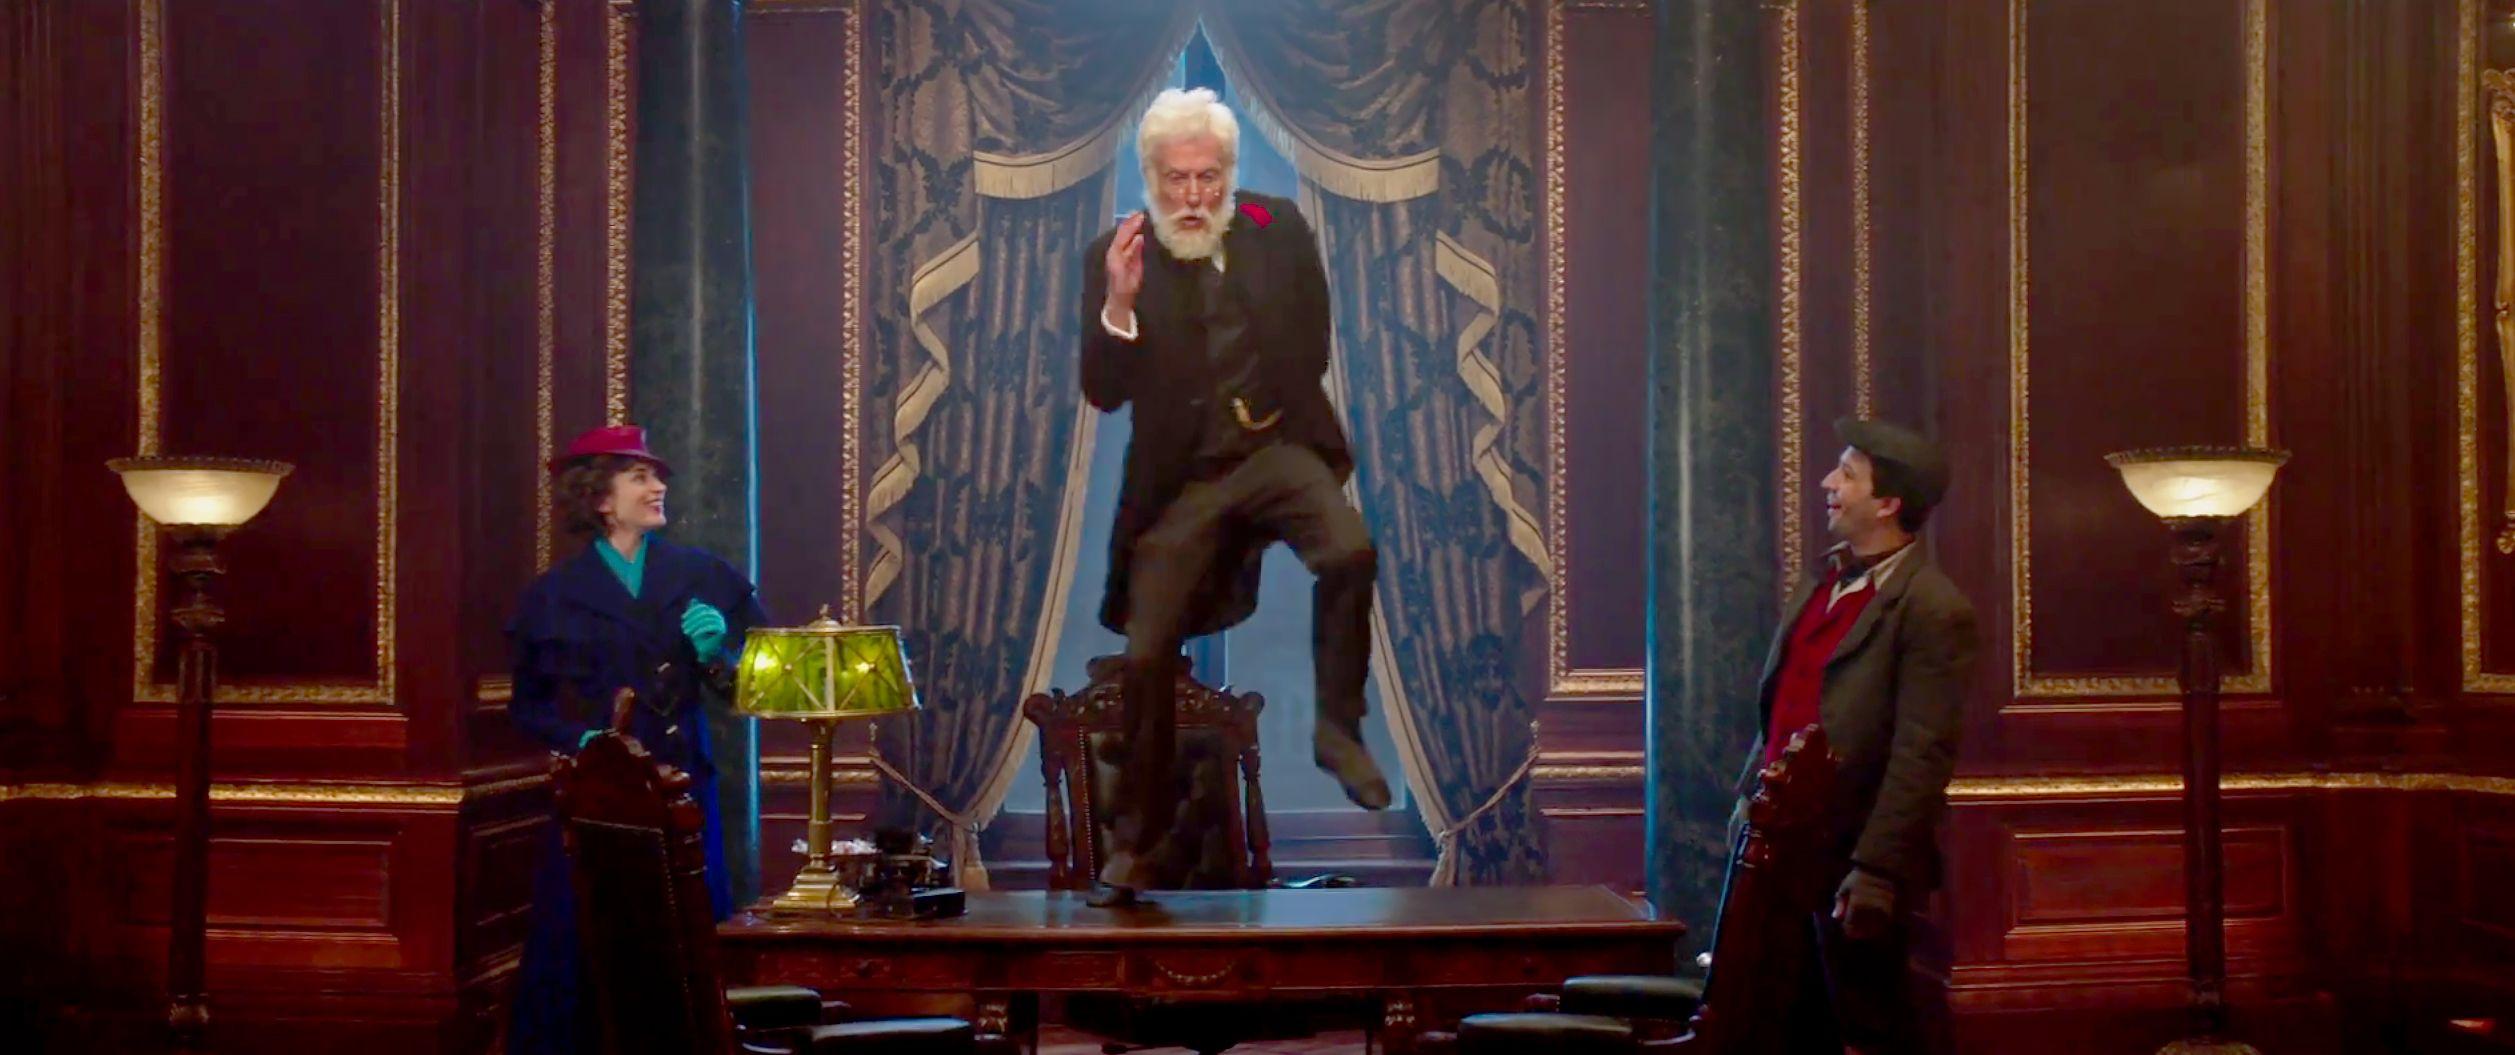 El regreso de Mary Poppins pelicula - Dick Van Dyke Mary Poppins